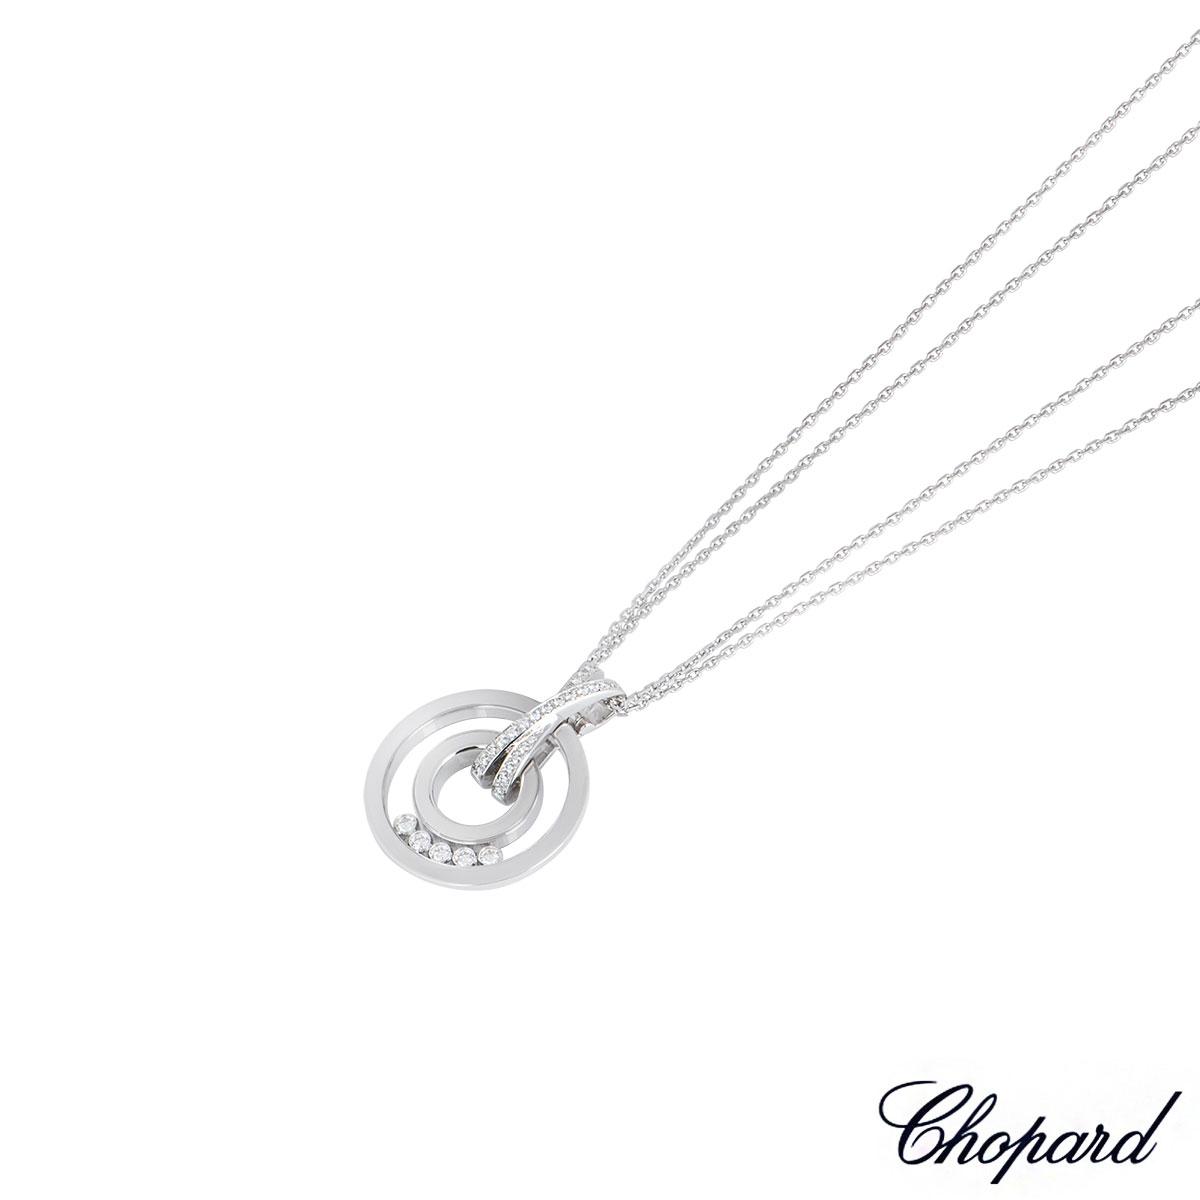 Chopard White Gold Happy Diamonds Pendant